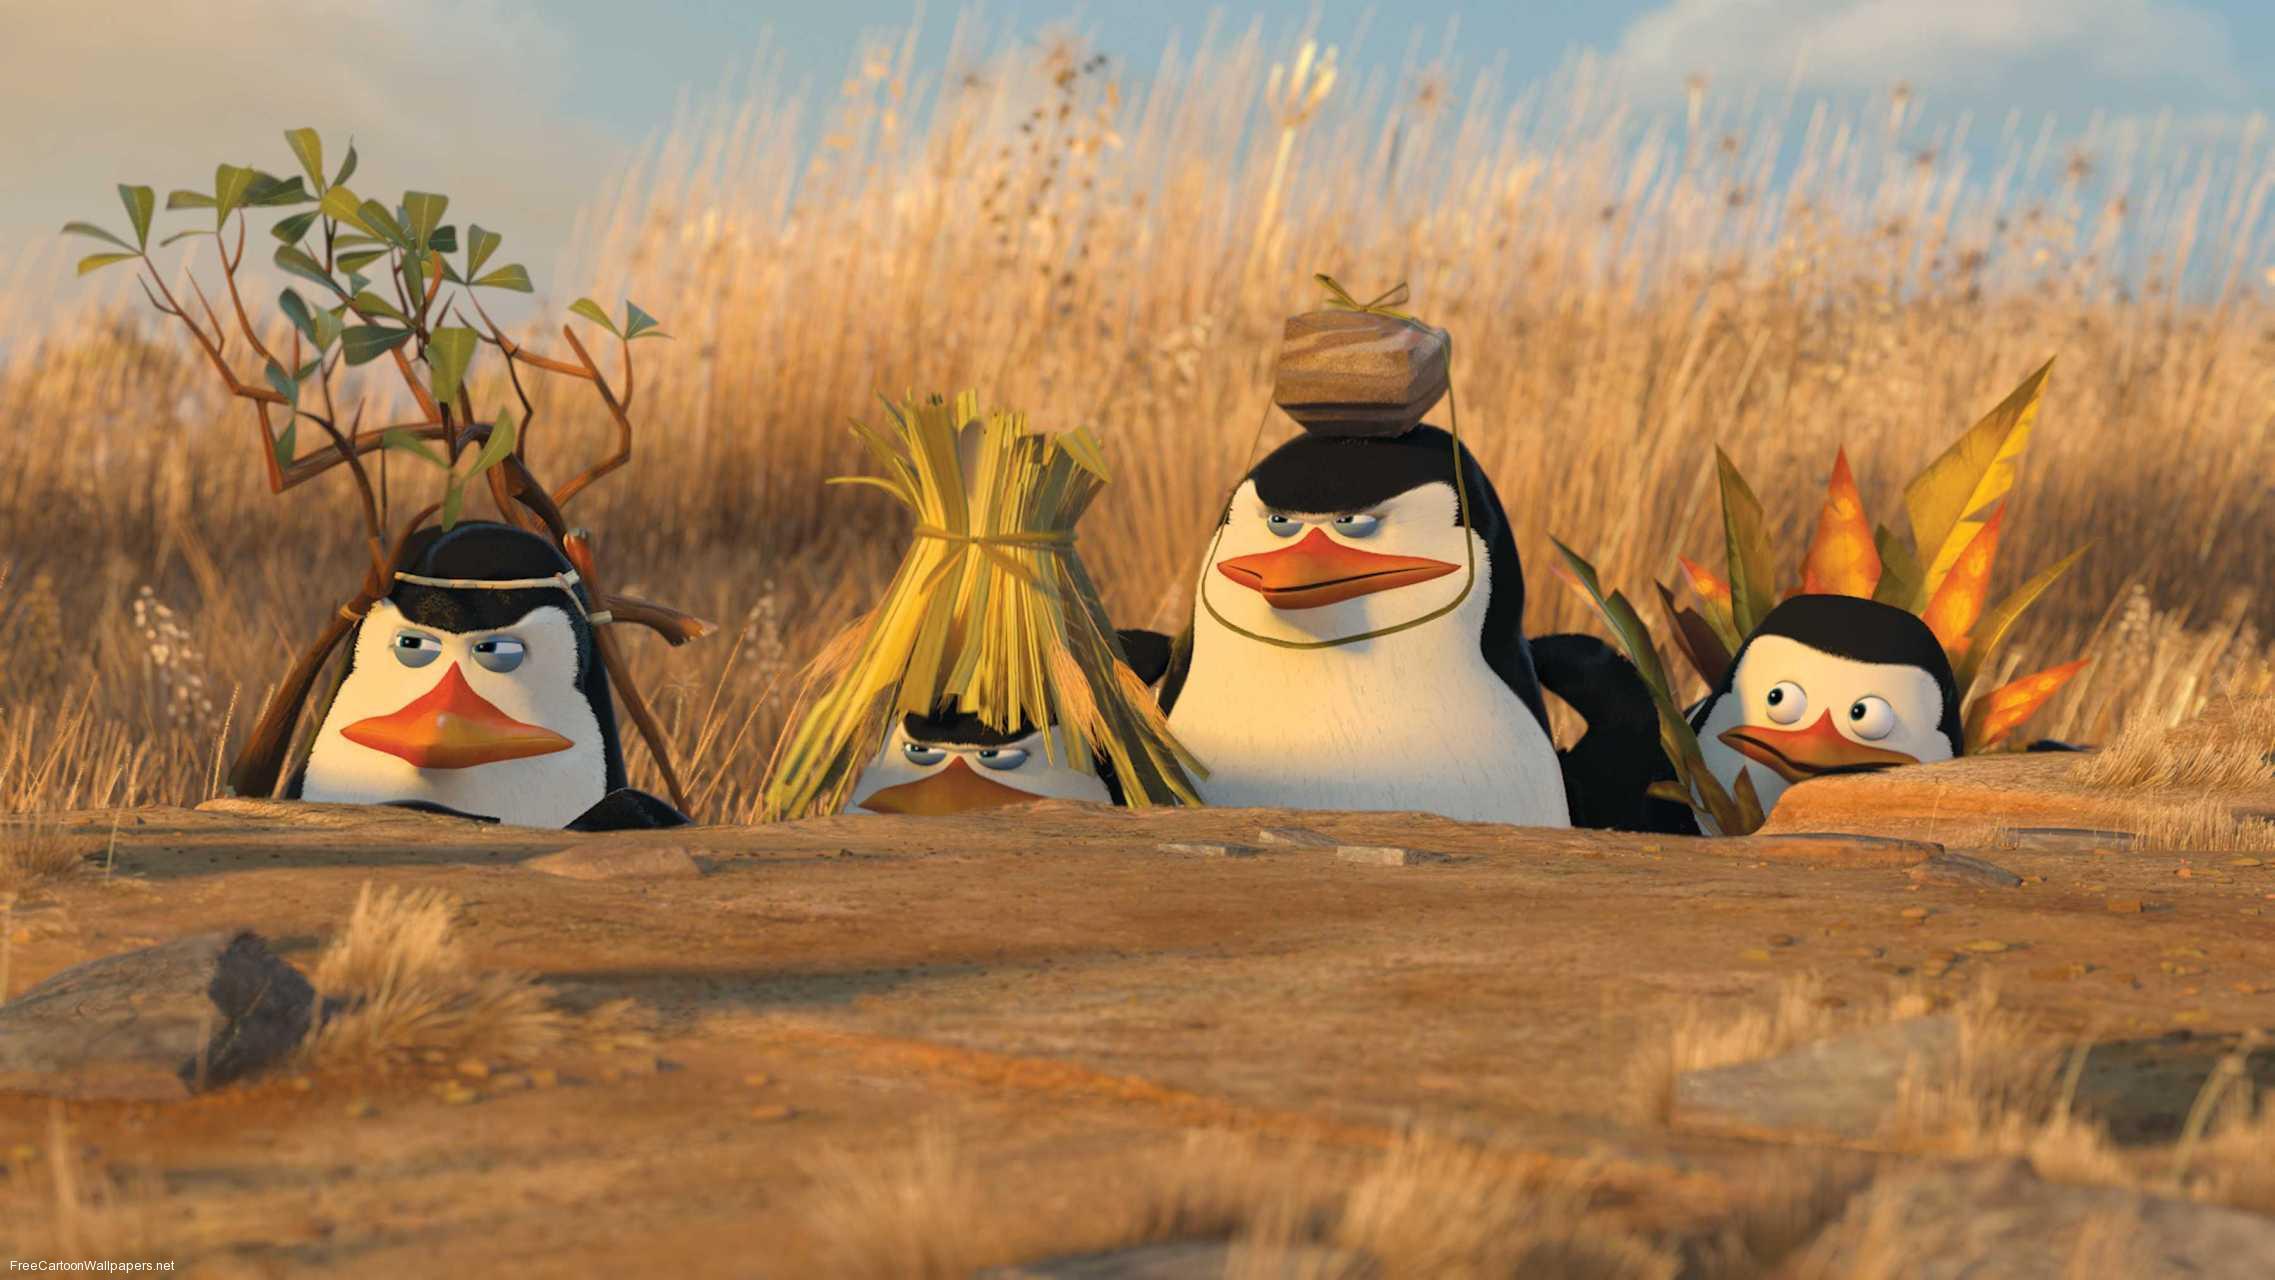 Madagascar 2 movie images